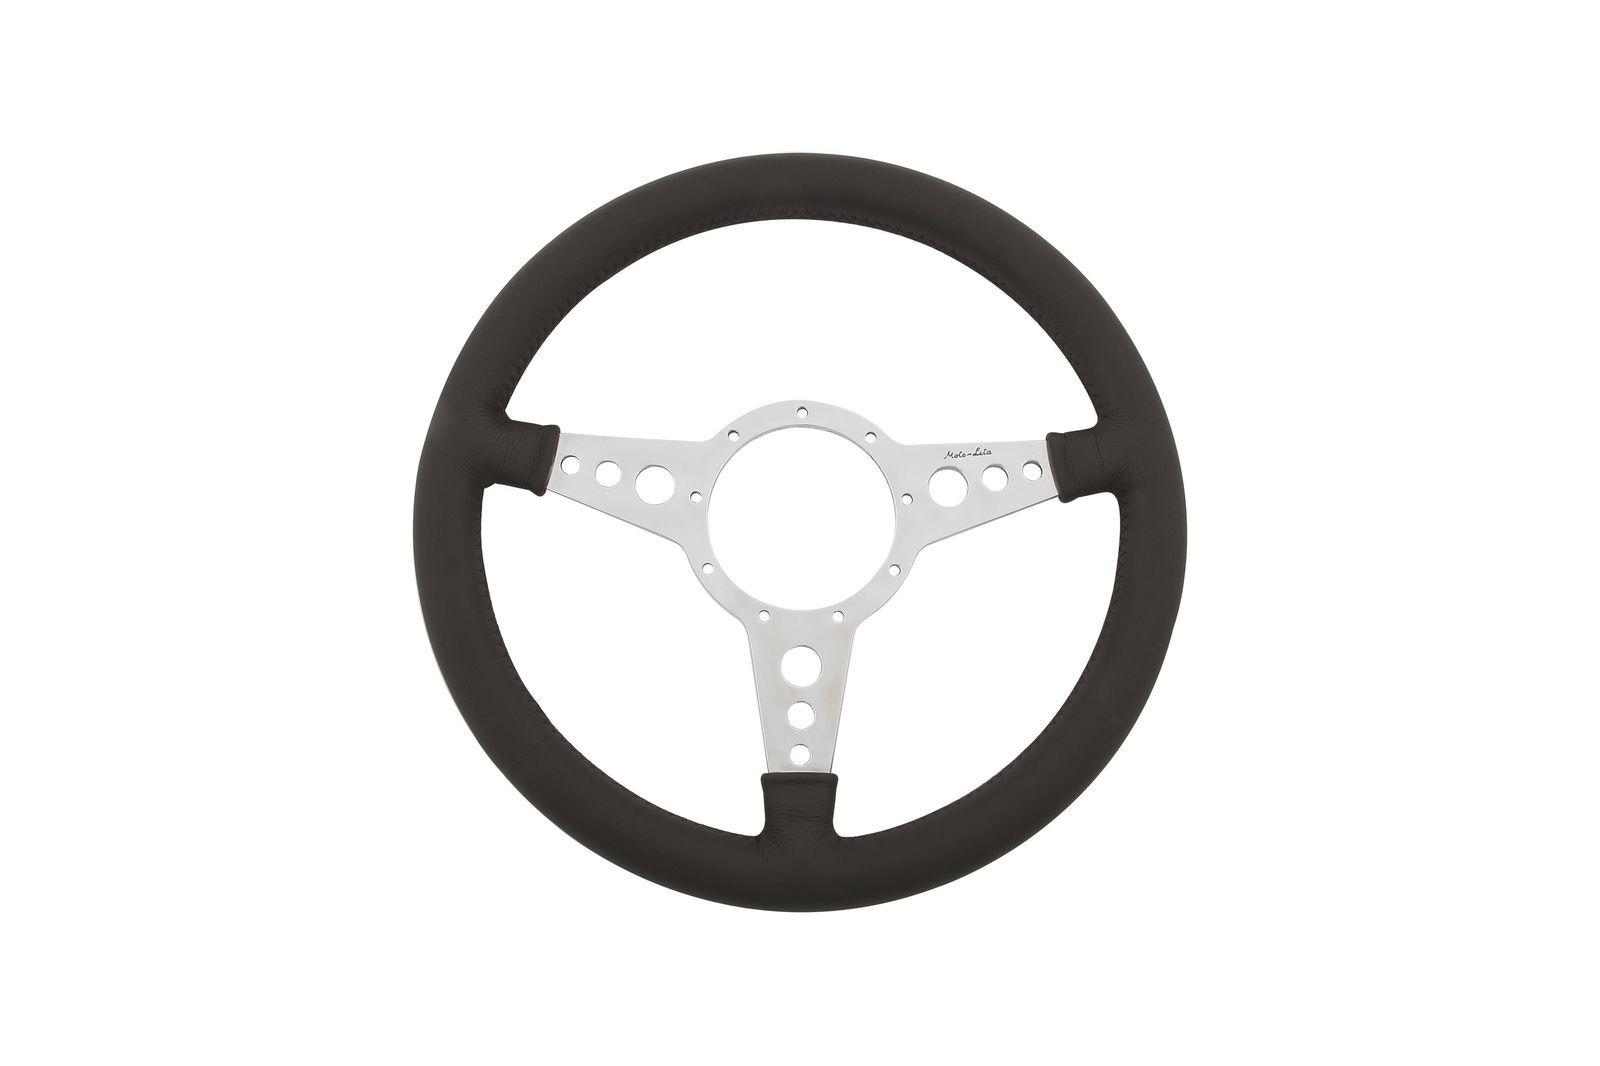 "#Leder-Lenkrad Moto-Lita flach 14"" gelocht poliert           , ML4FPD14"